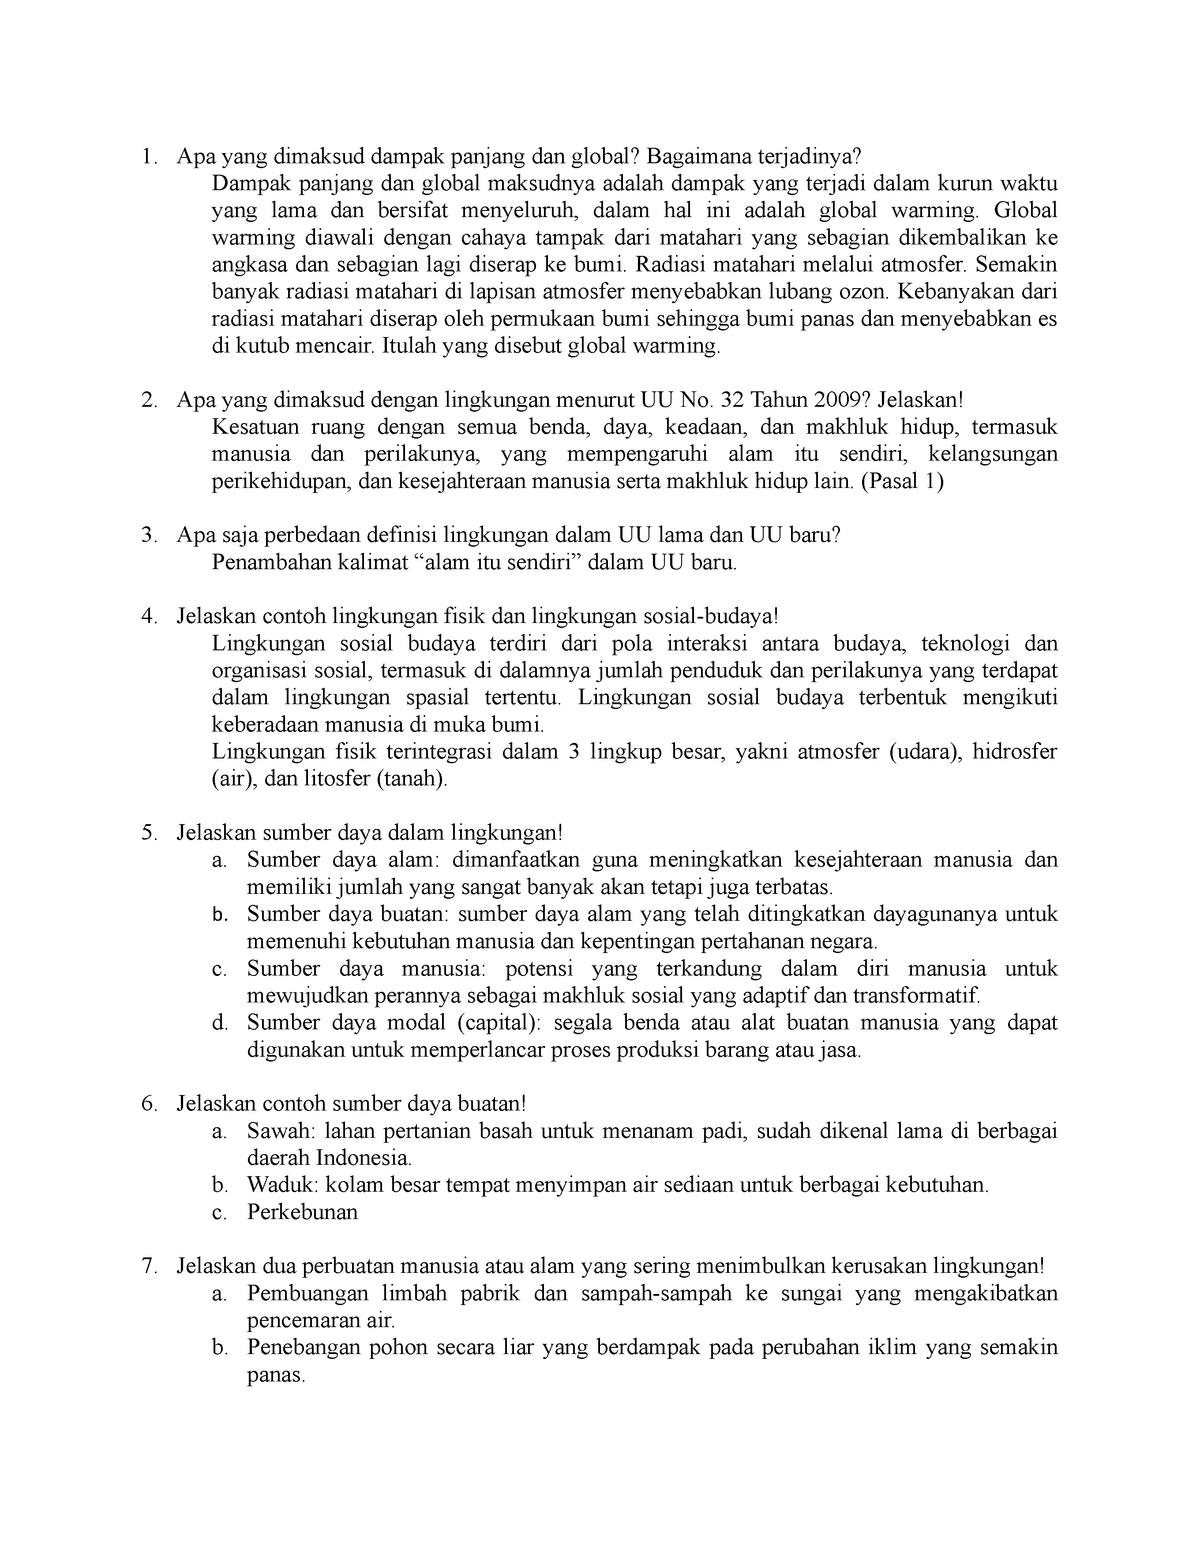 Soal Dan Jawaban Kuis Semester Pendek Hukum Lingkungan Studocu